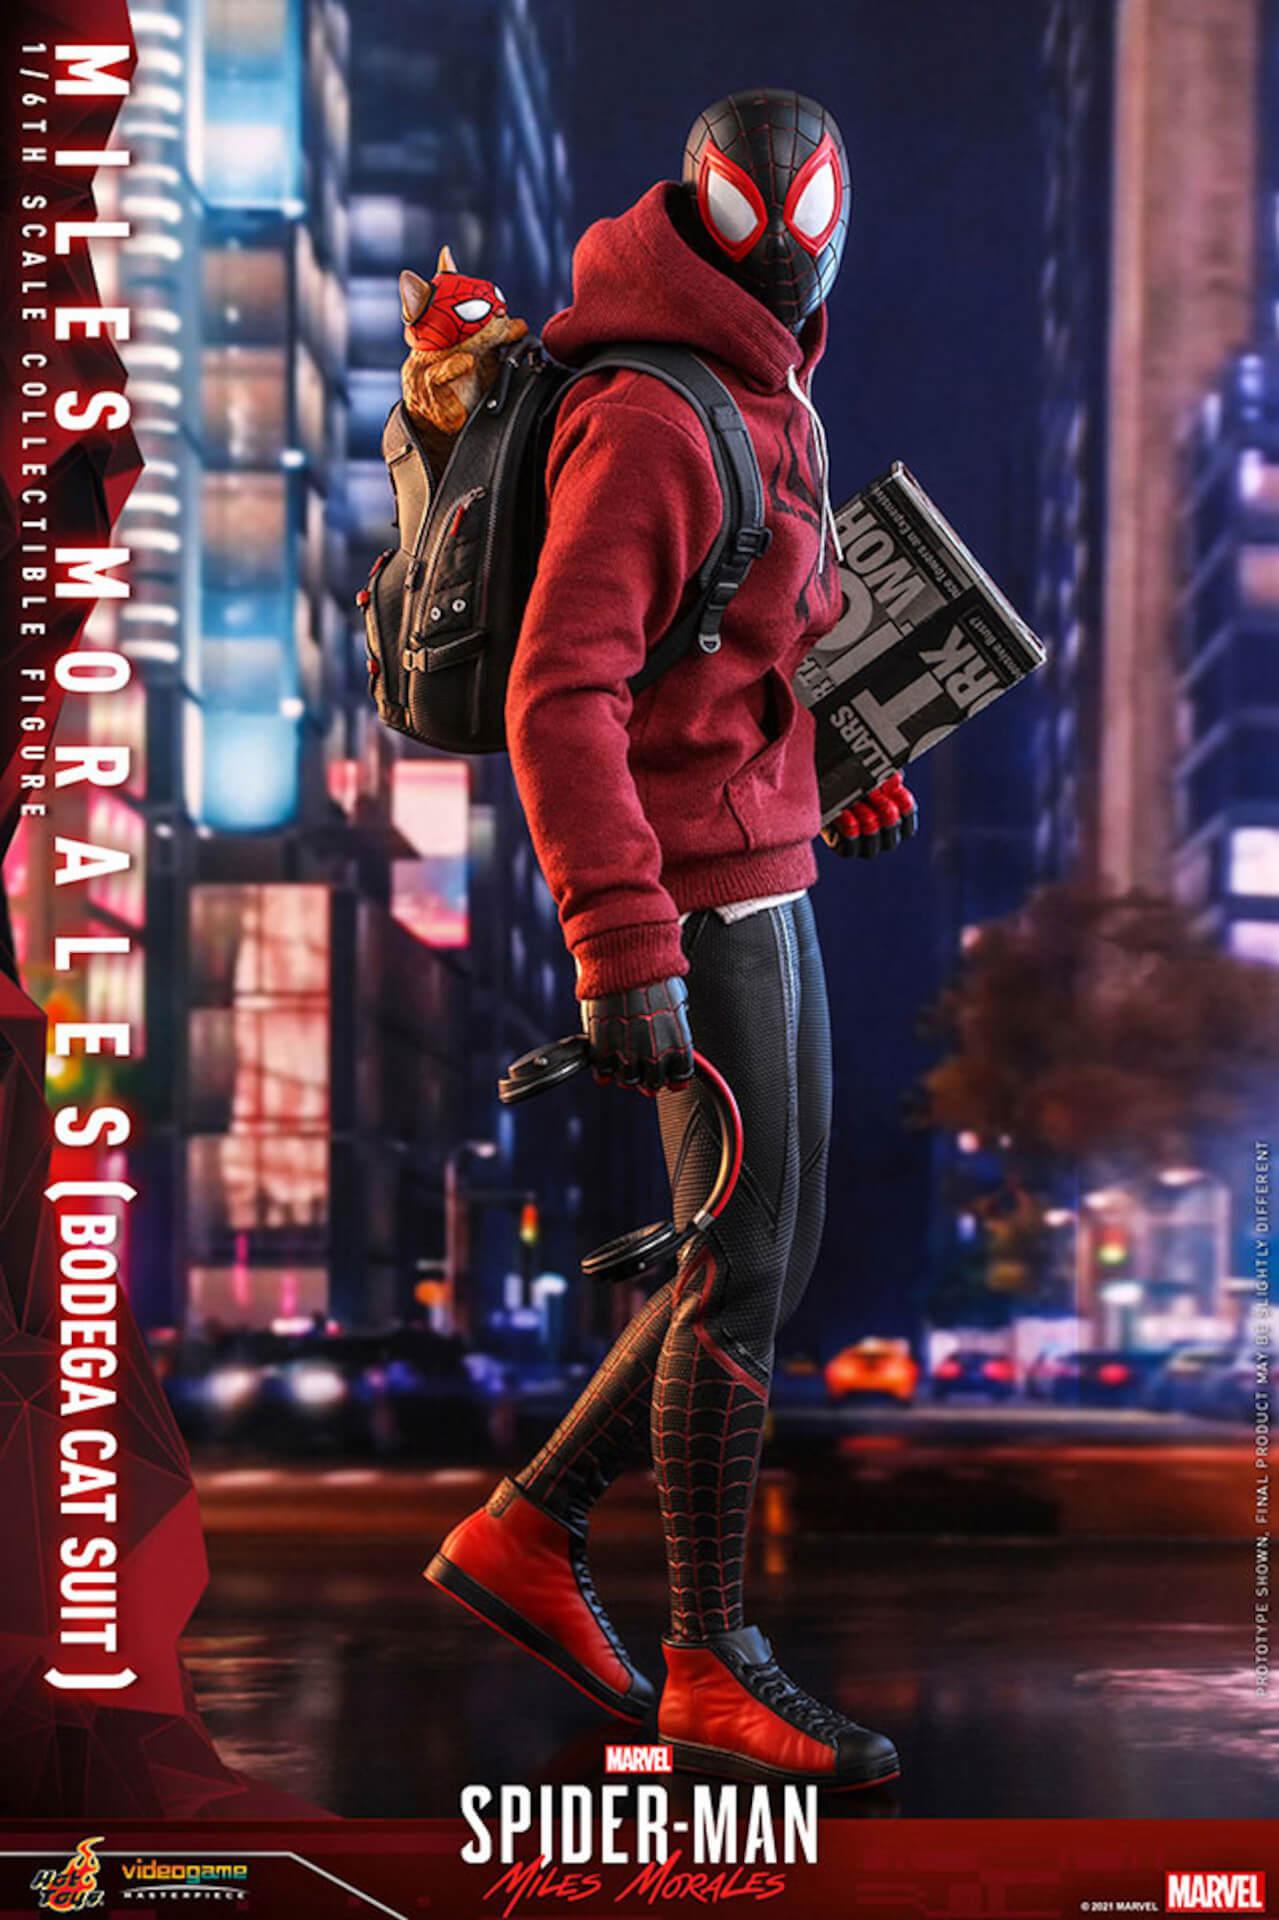 『Marvel's Spider-Man:Miles Morales』のスパイダーマンがホットトイズで超精巧なフィギュアになって登場! art210601_spiderman_hottoys_5